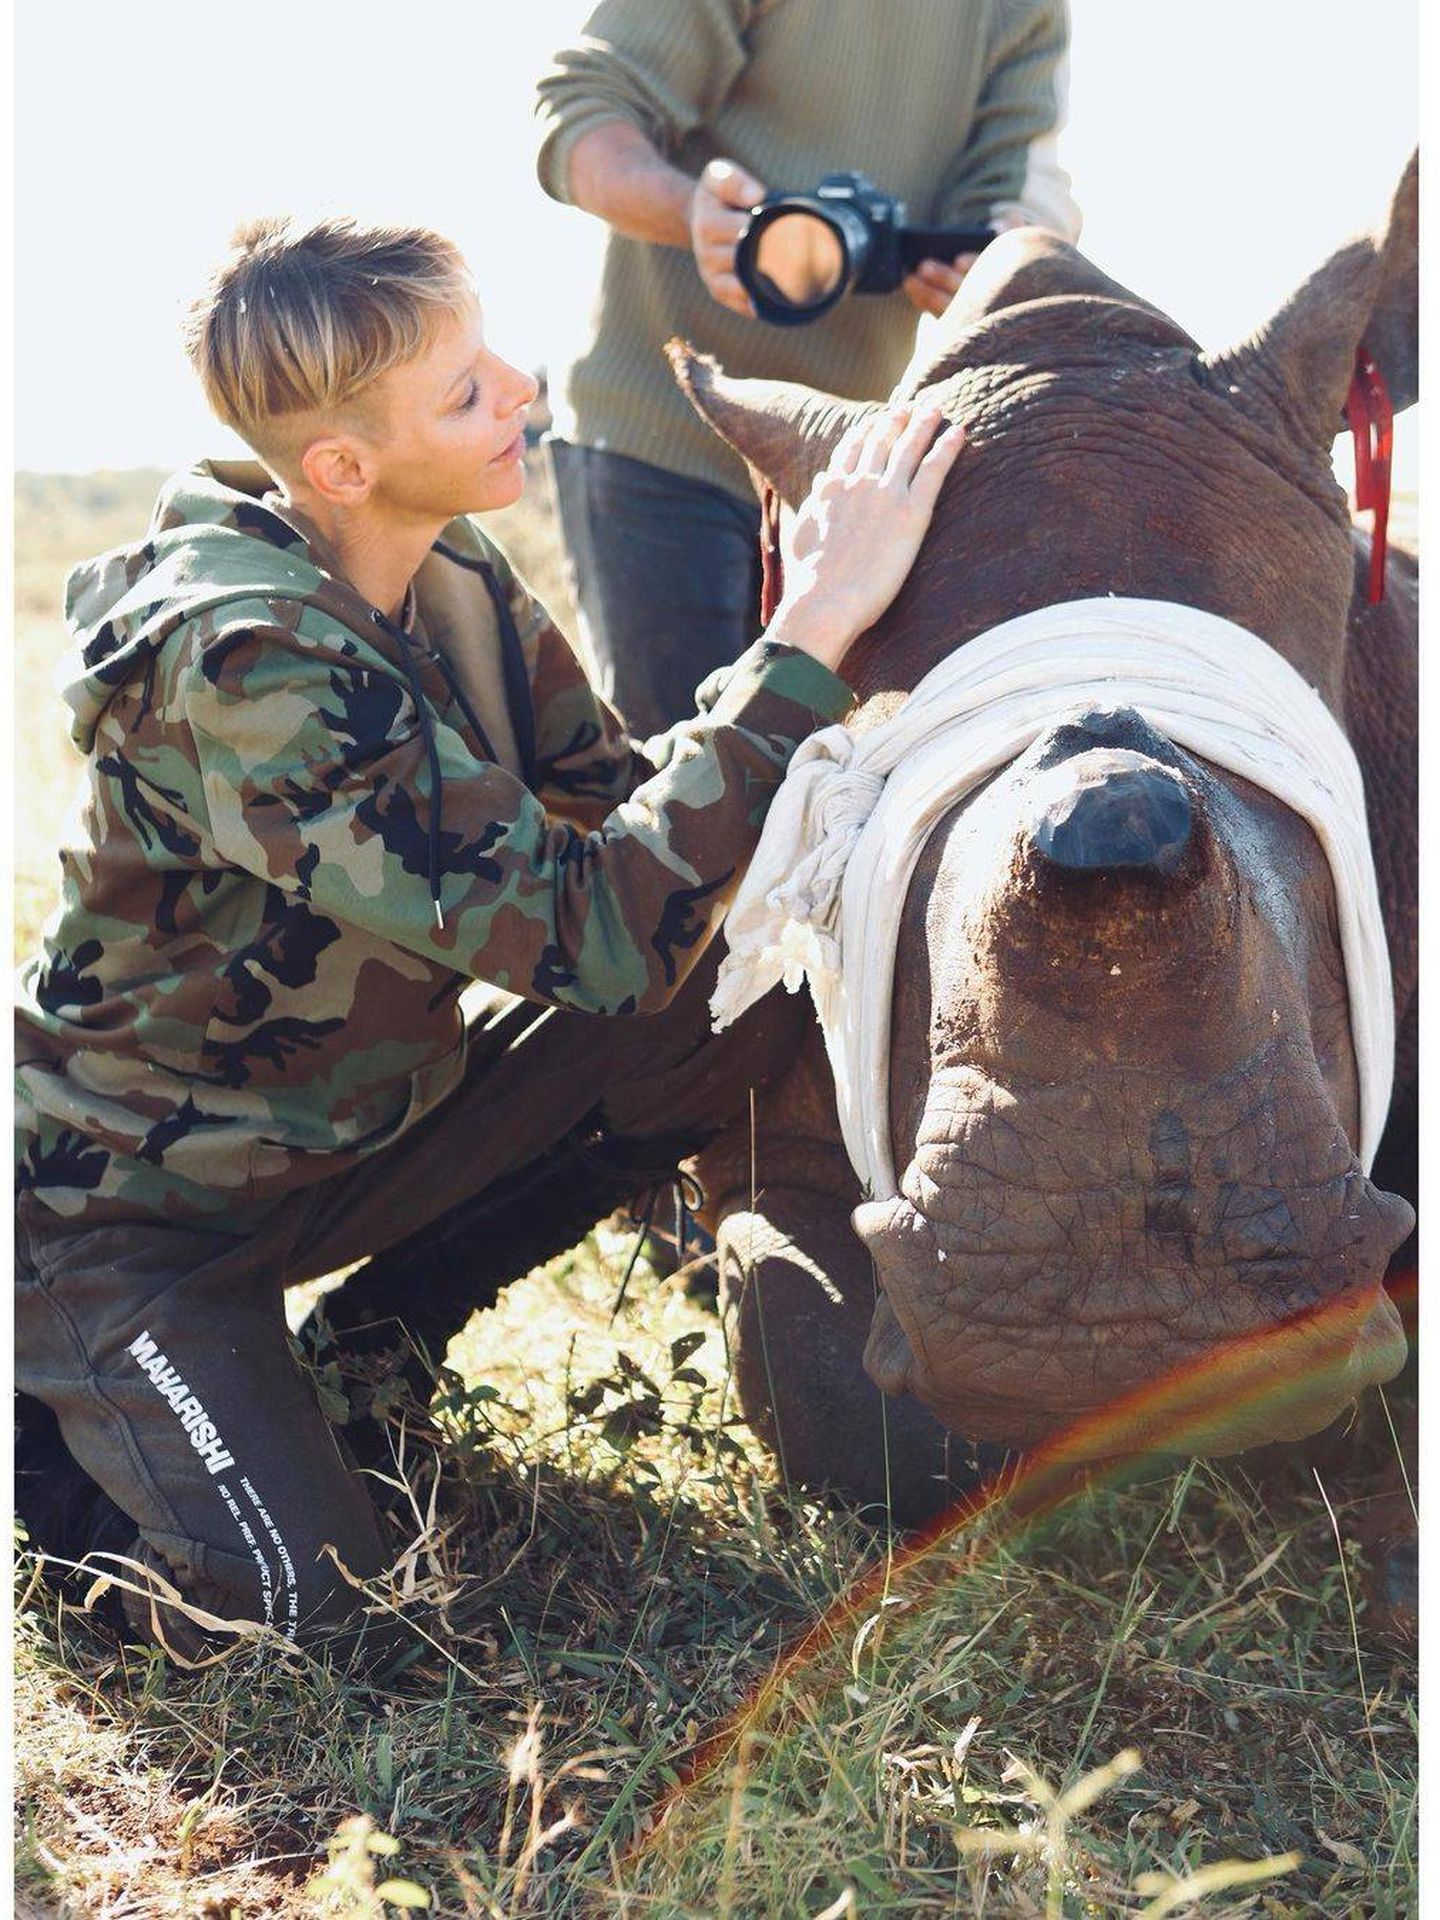 La princesa Charlène en Sudáfrica. (Redes)